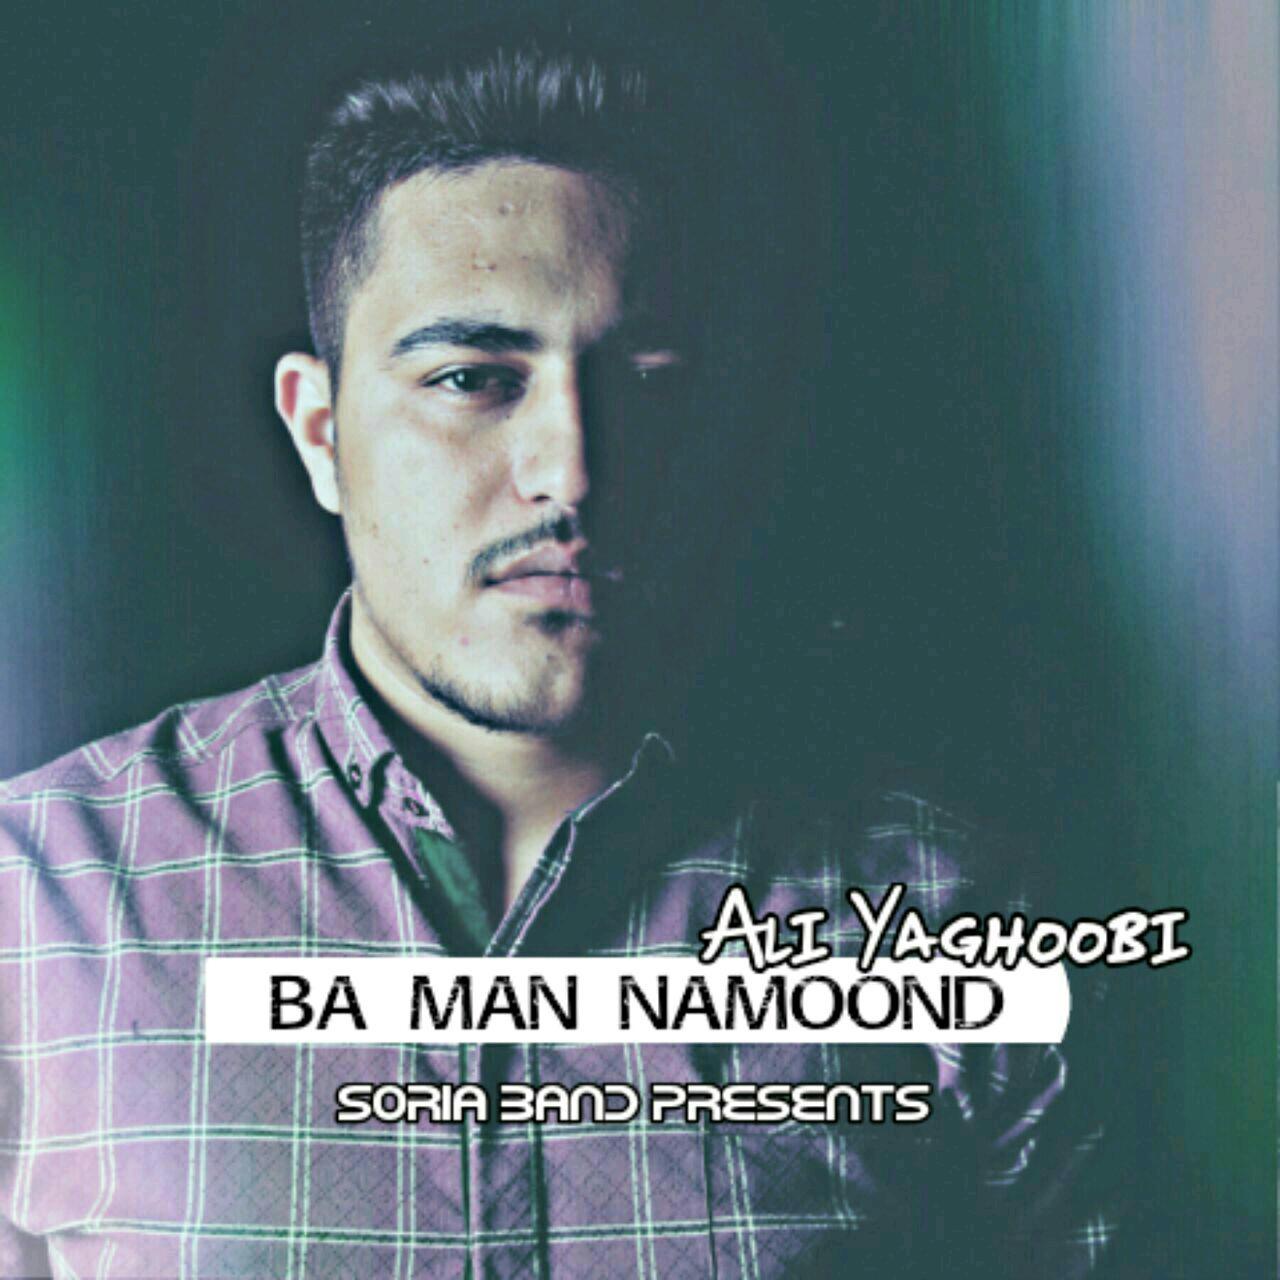 Ali Yaghoobi – Ba Man Namoond